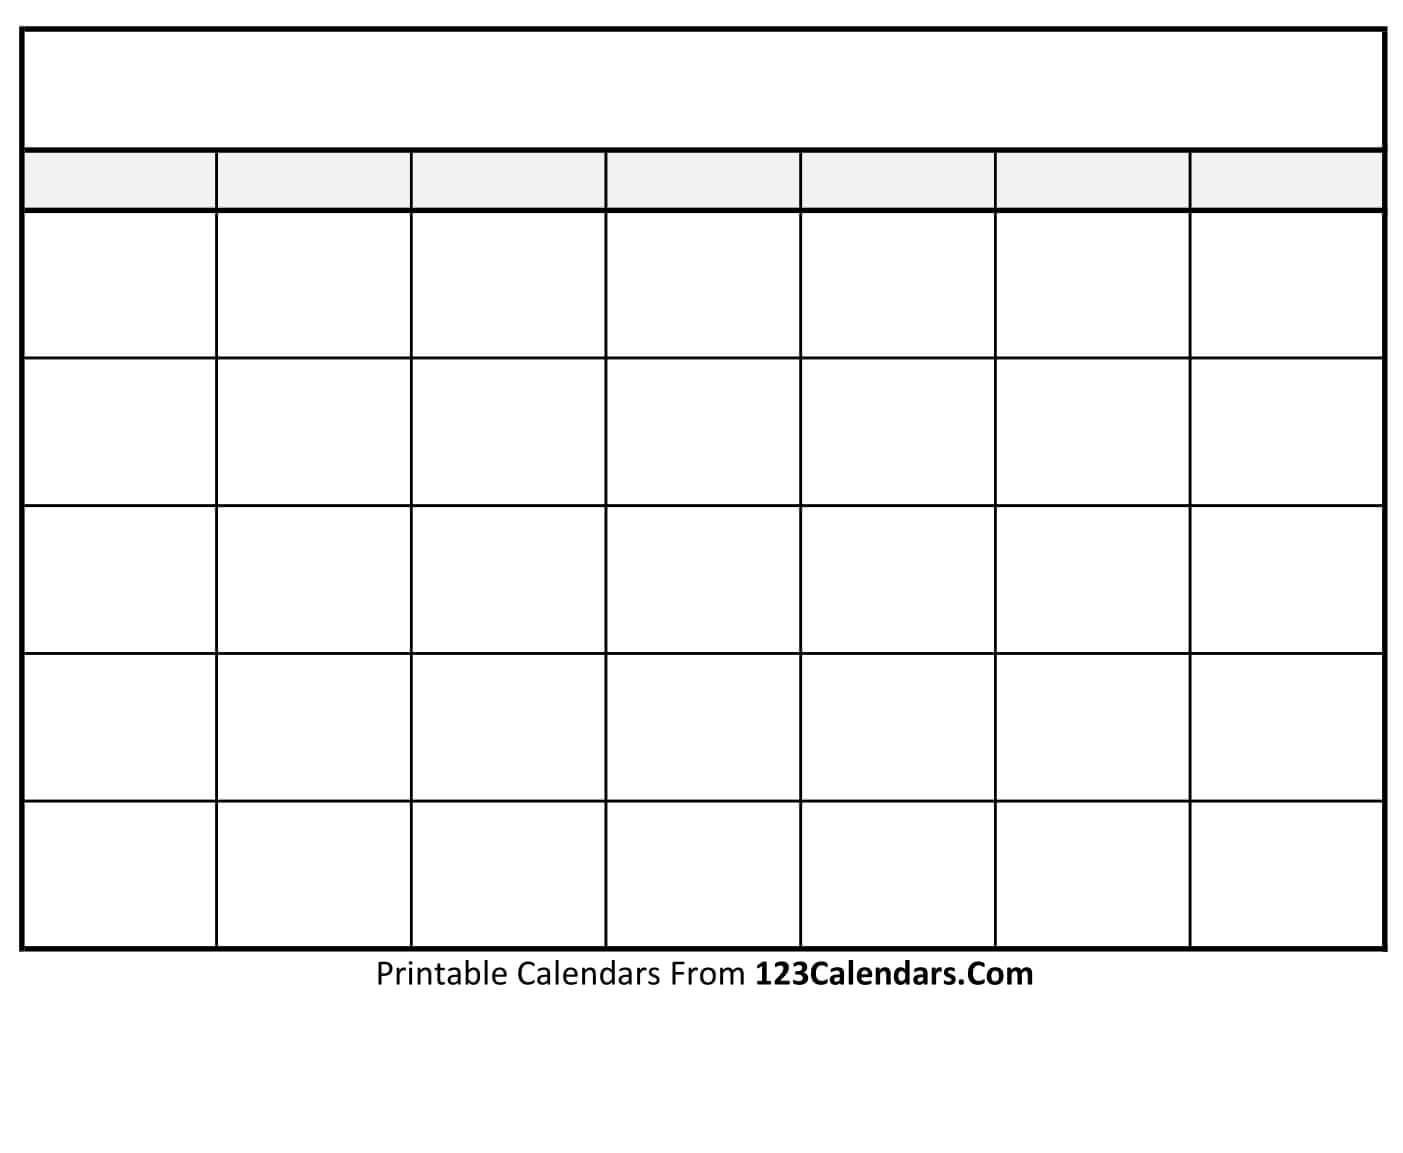 Free Printable Blank Calendar | 123Calendars-Printable Blank Calendar Sheets